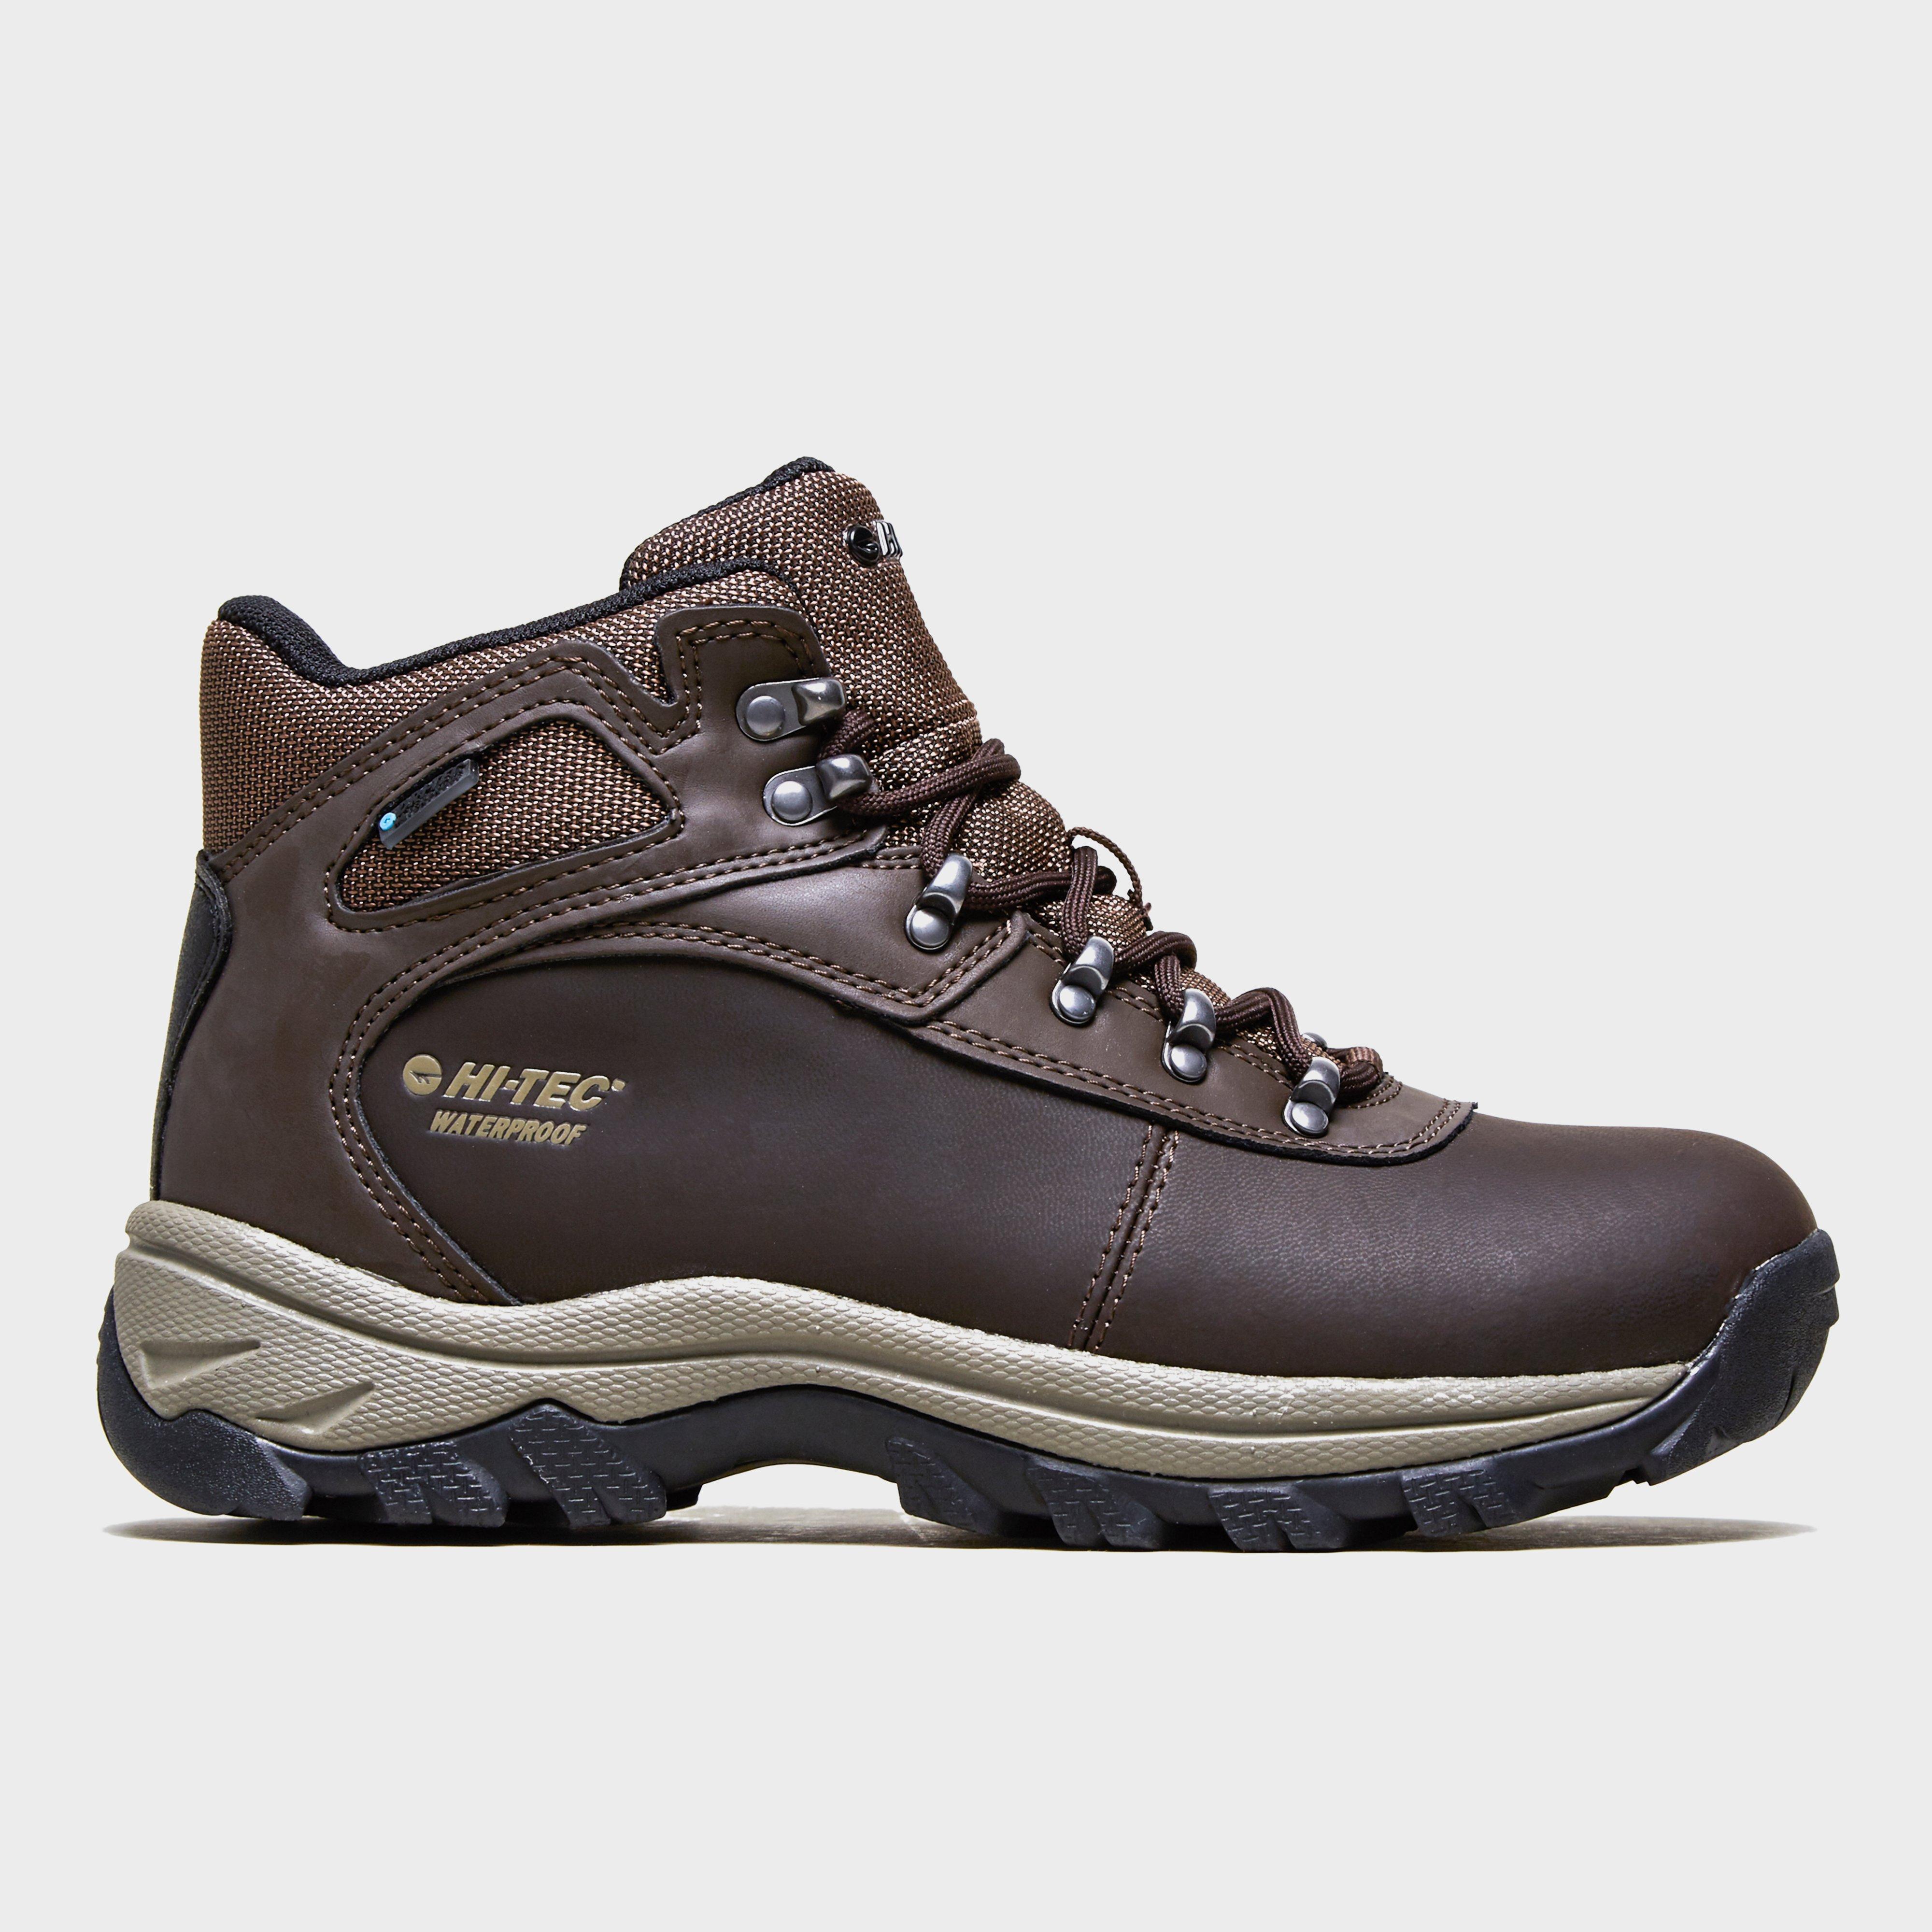 New Hi-Tec Womens Altitude Basecamp Walking Boots Outdoor Footwear Shoe